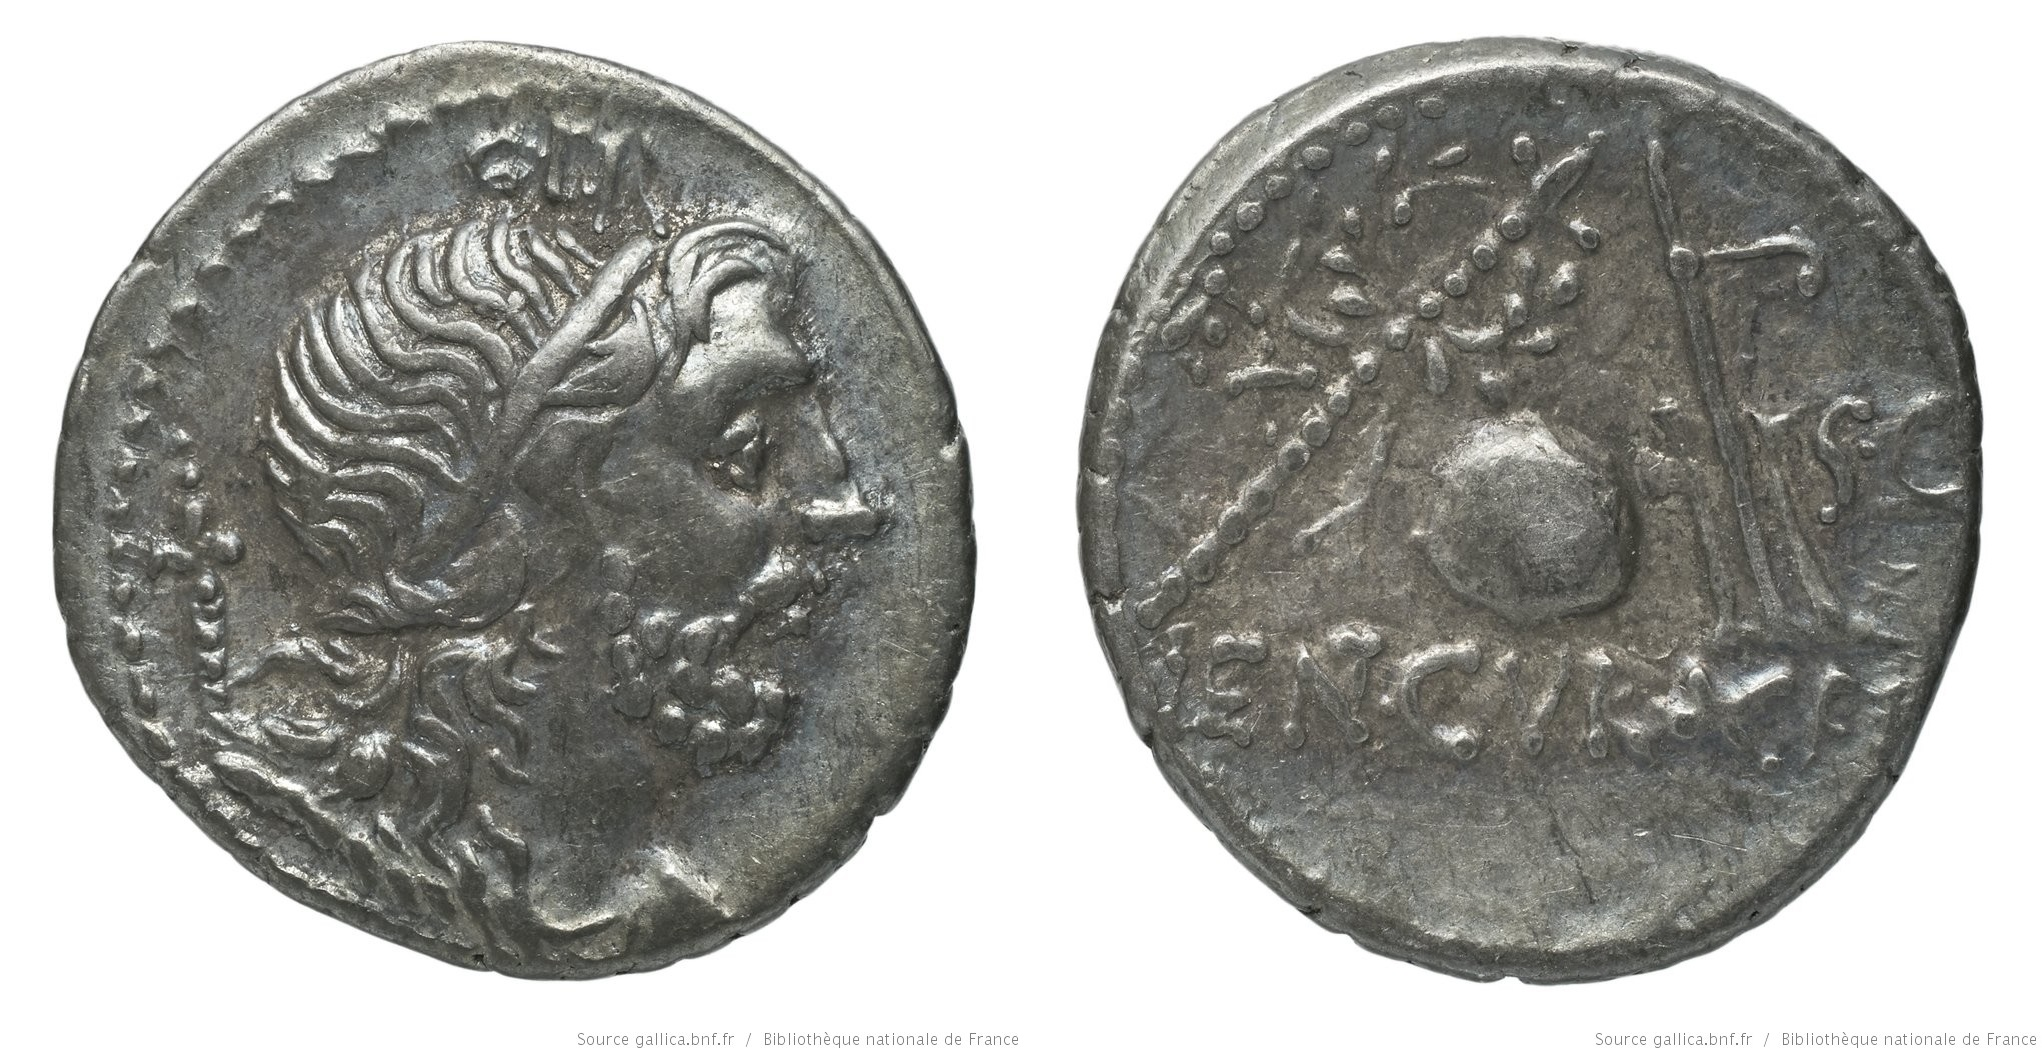 1335CO – Denier Cornelia – Cnæus Cornelius Lentulus Marcellinus